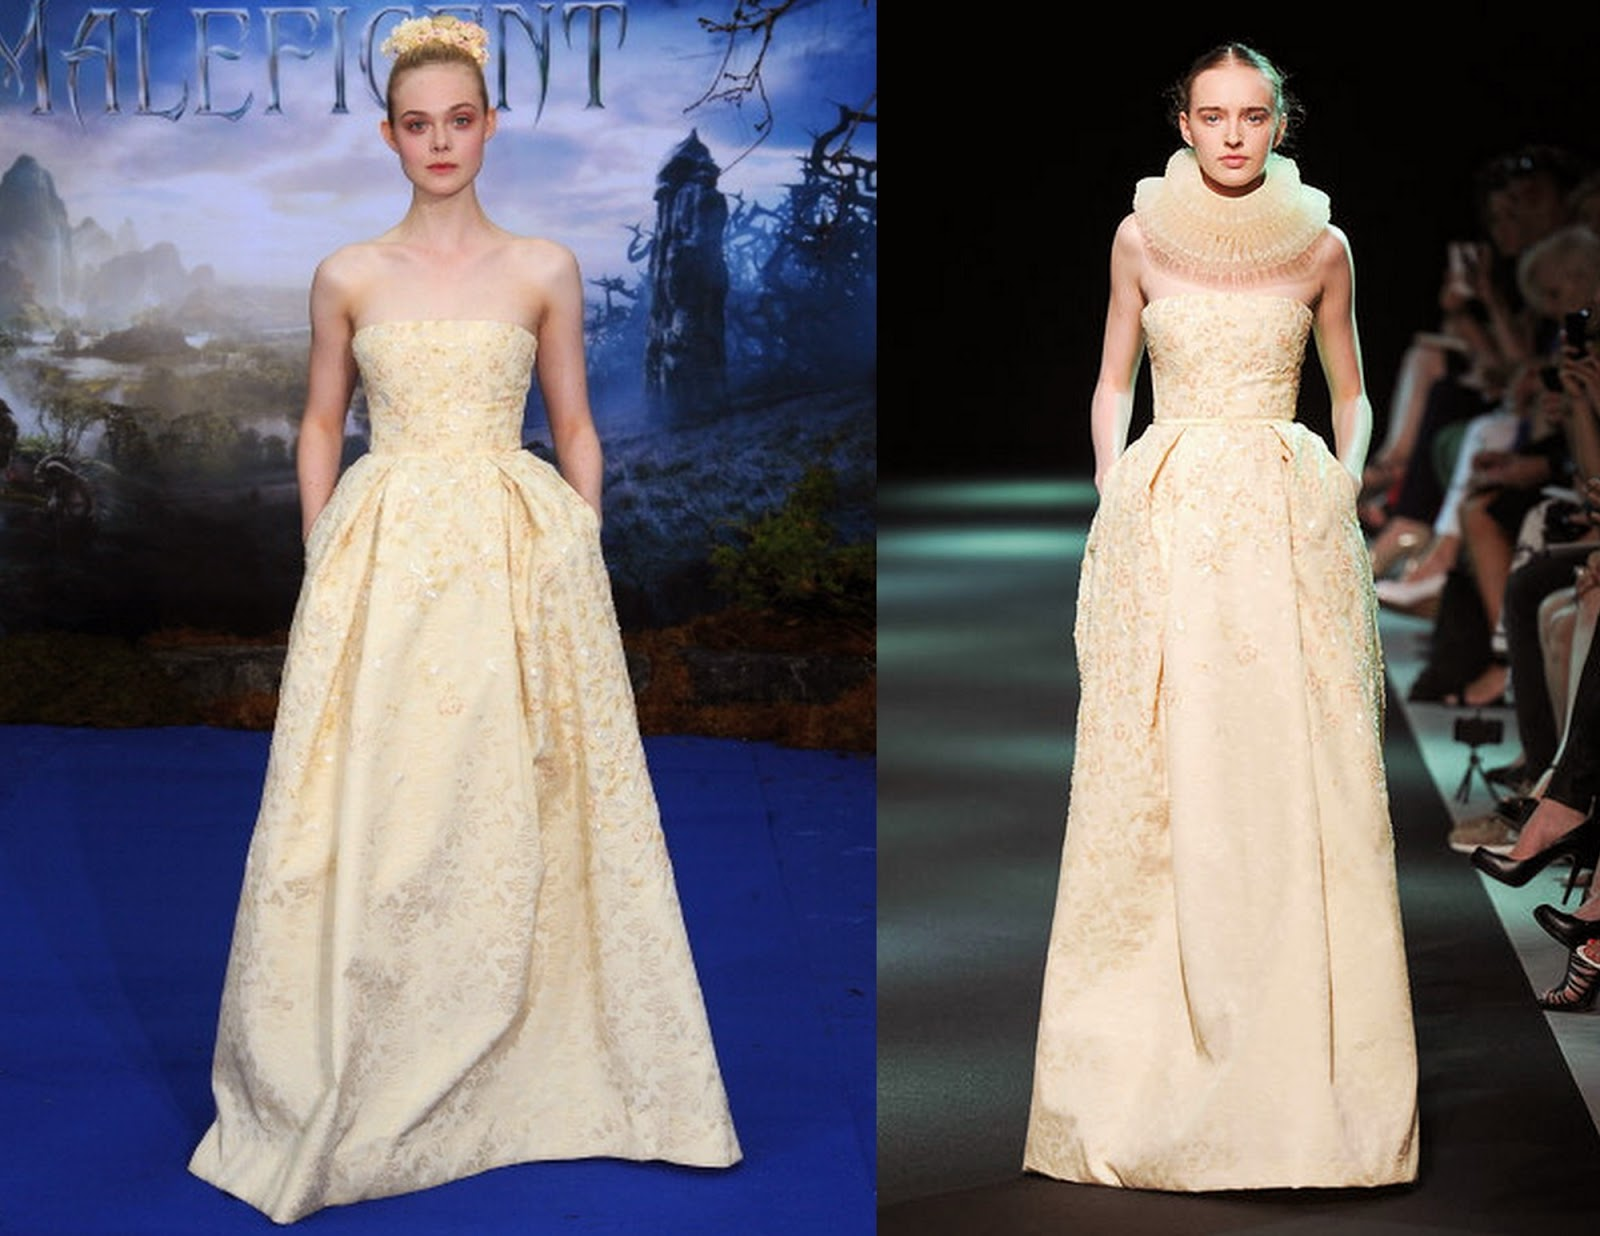 Elle-fanning-Georges-Hobeika-Couture-premiere-maleficient-catwalk-model